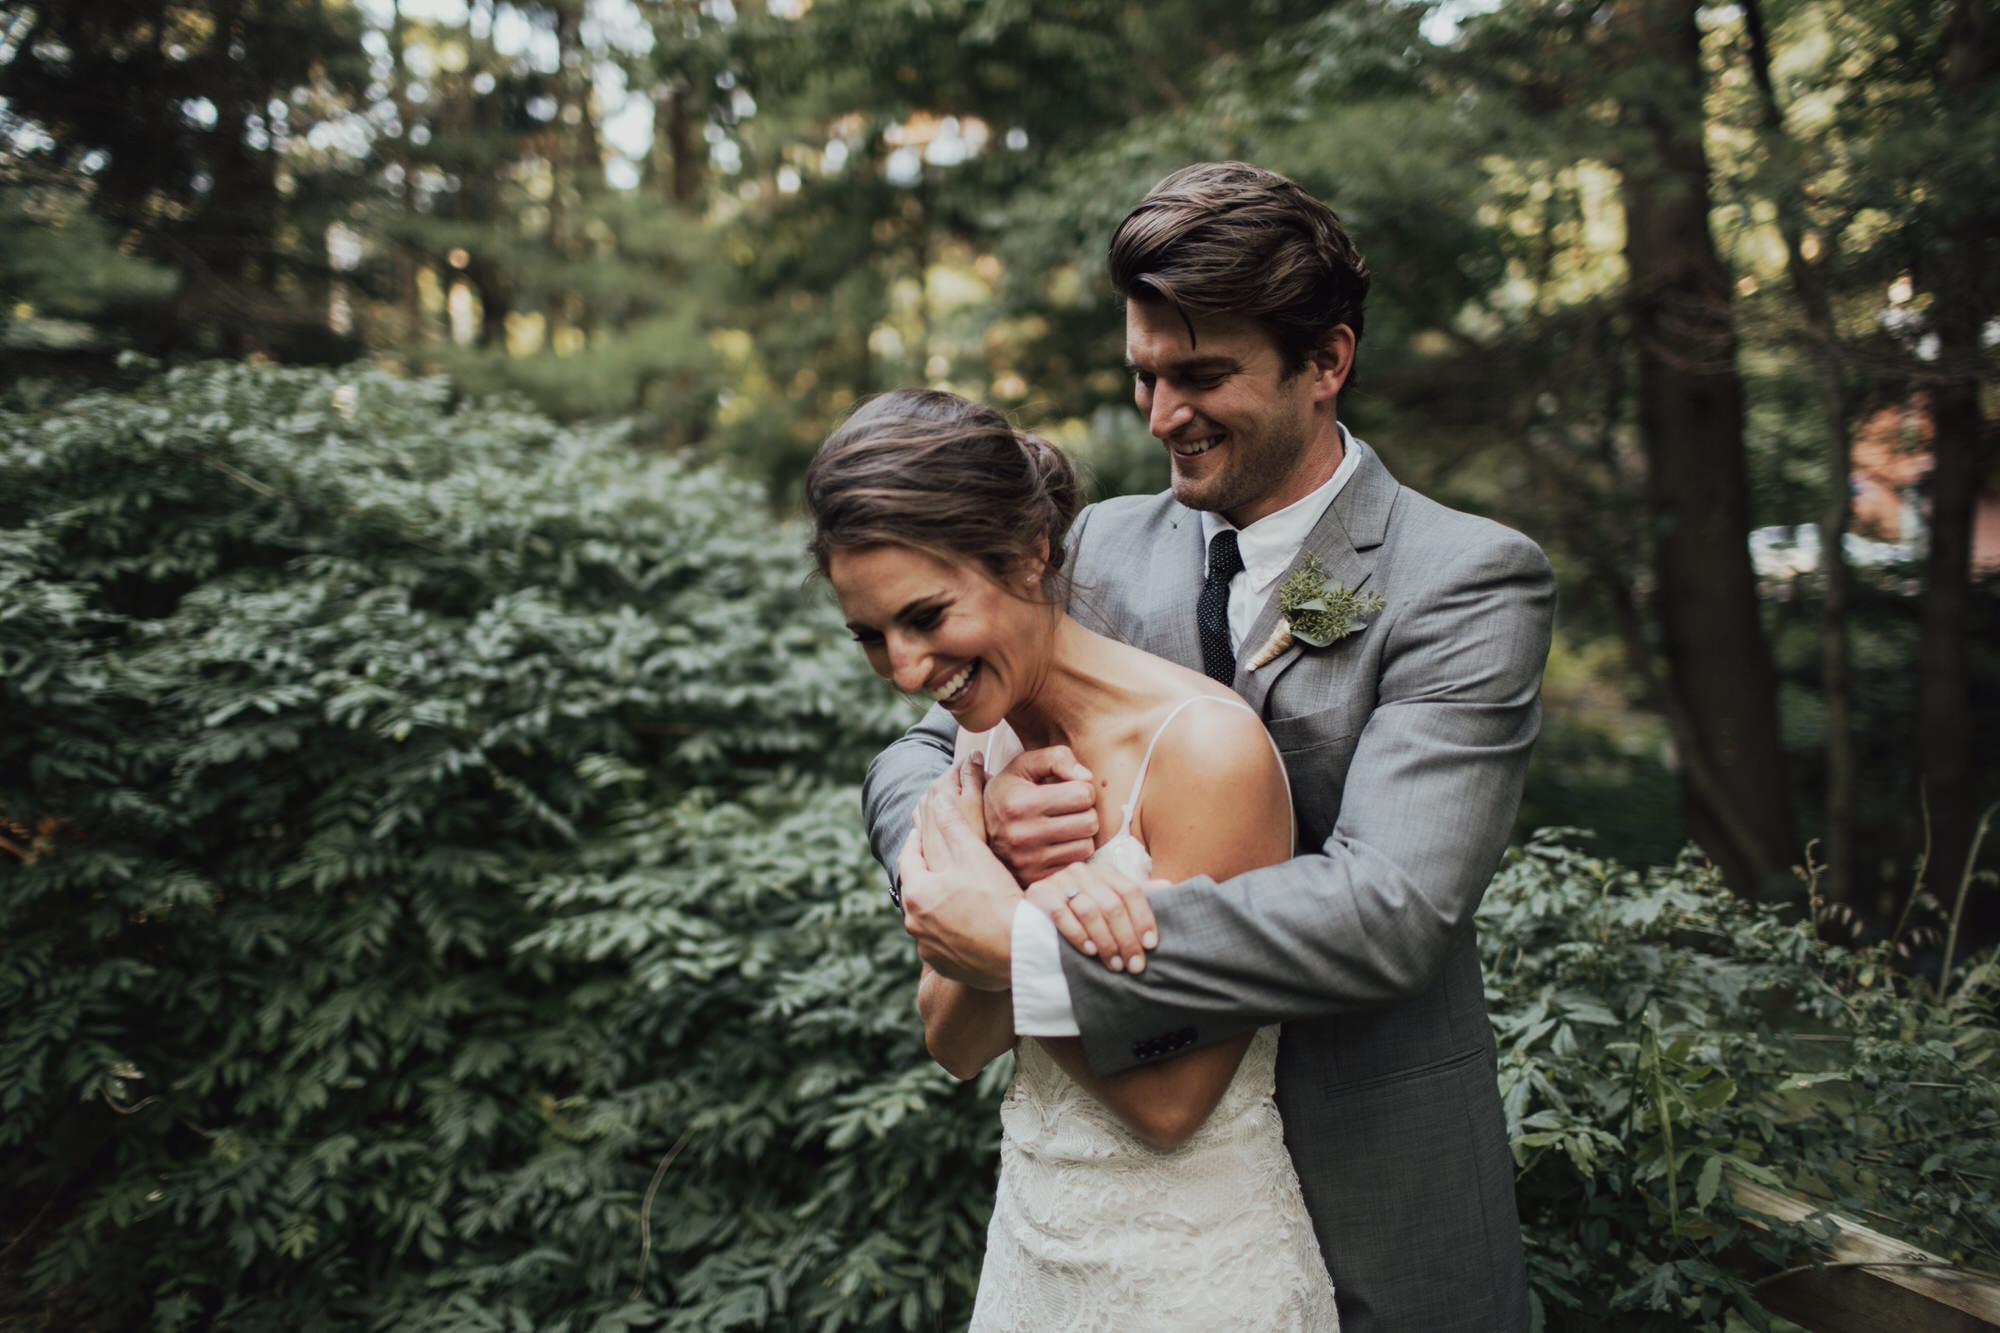 emily-aaron-rochester-new-york-wedding-photographer-99.JPG